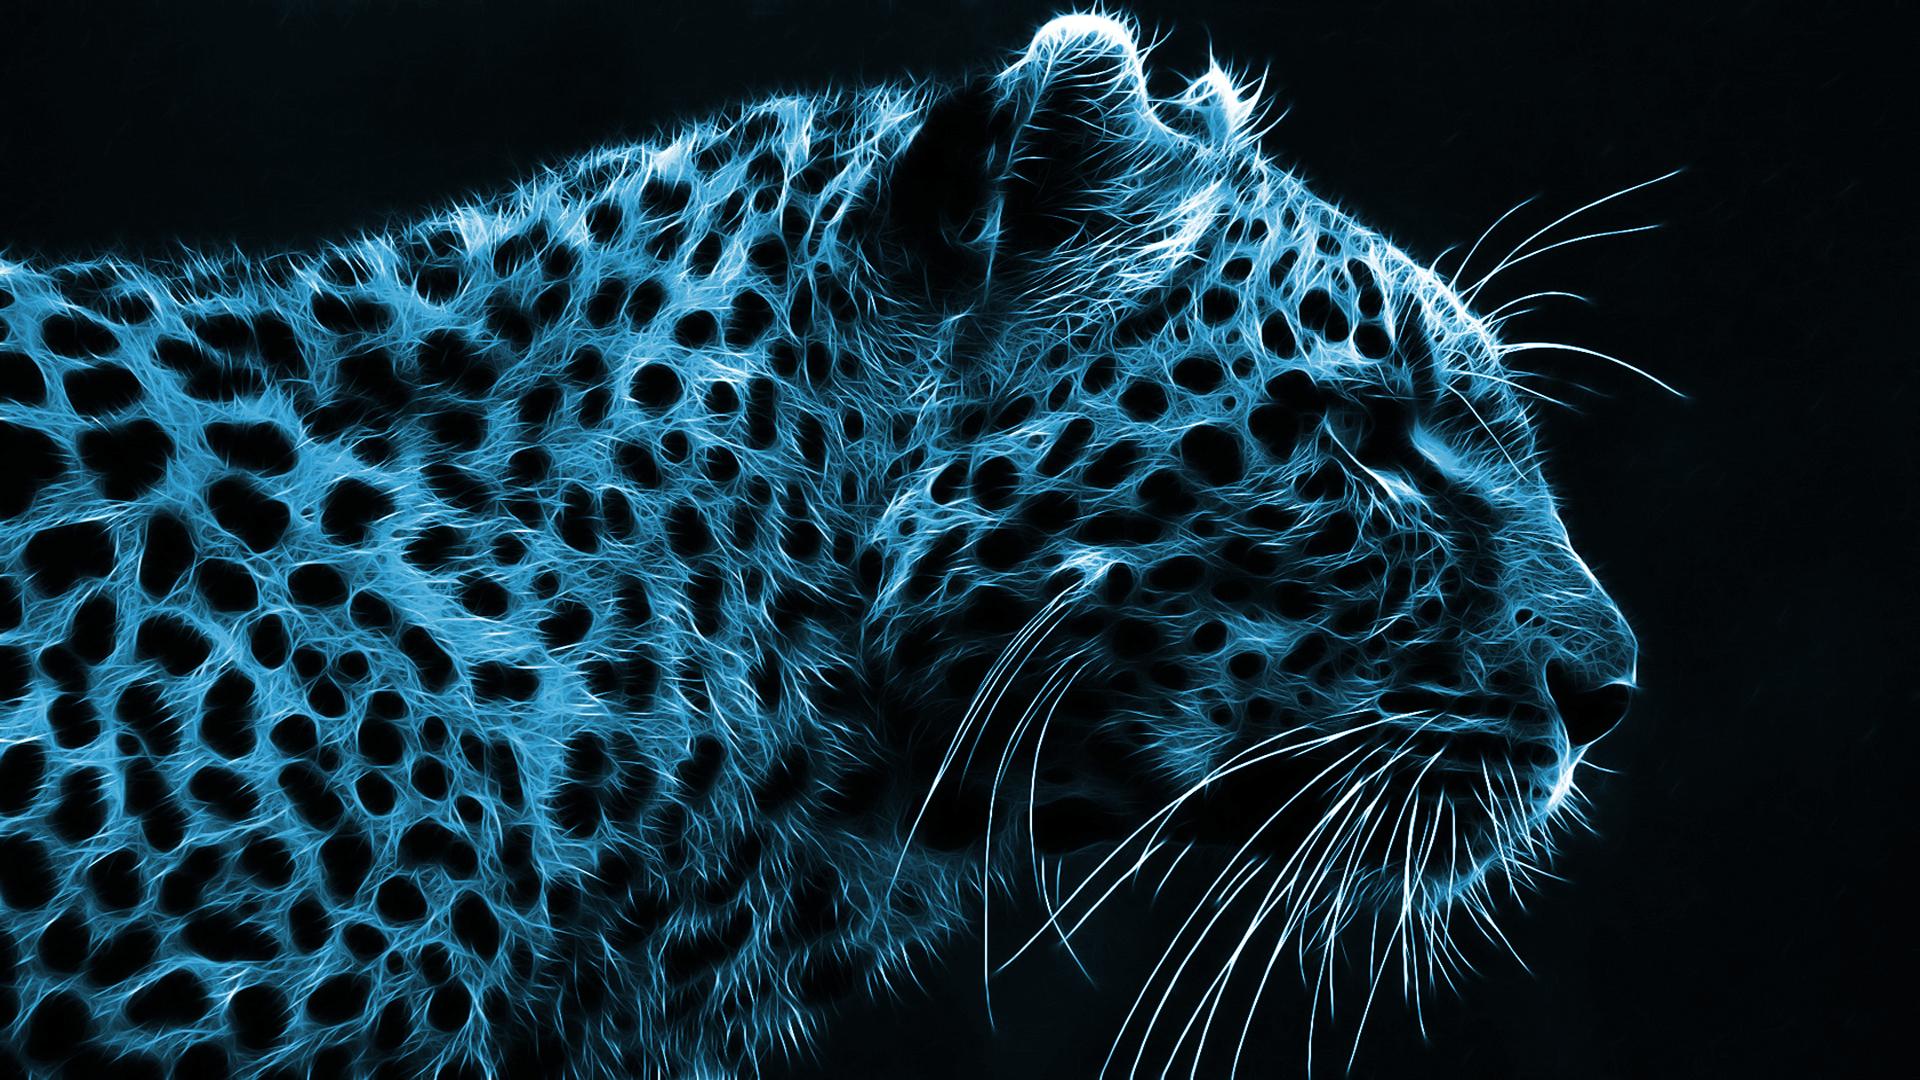 Pin Blue Cheetah Wallpapers 30978 1920x1080